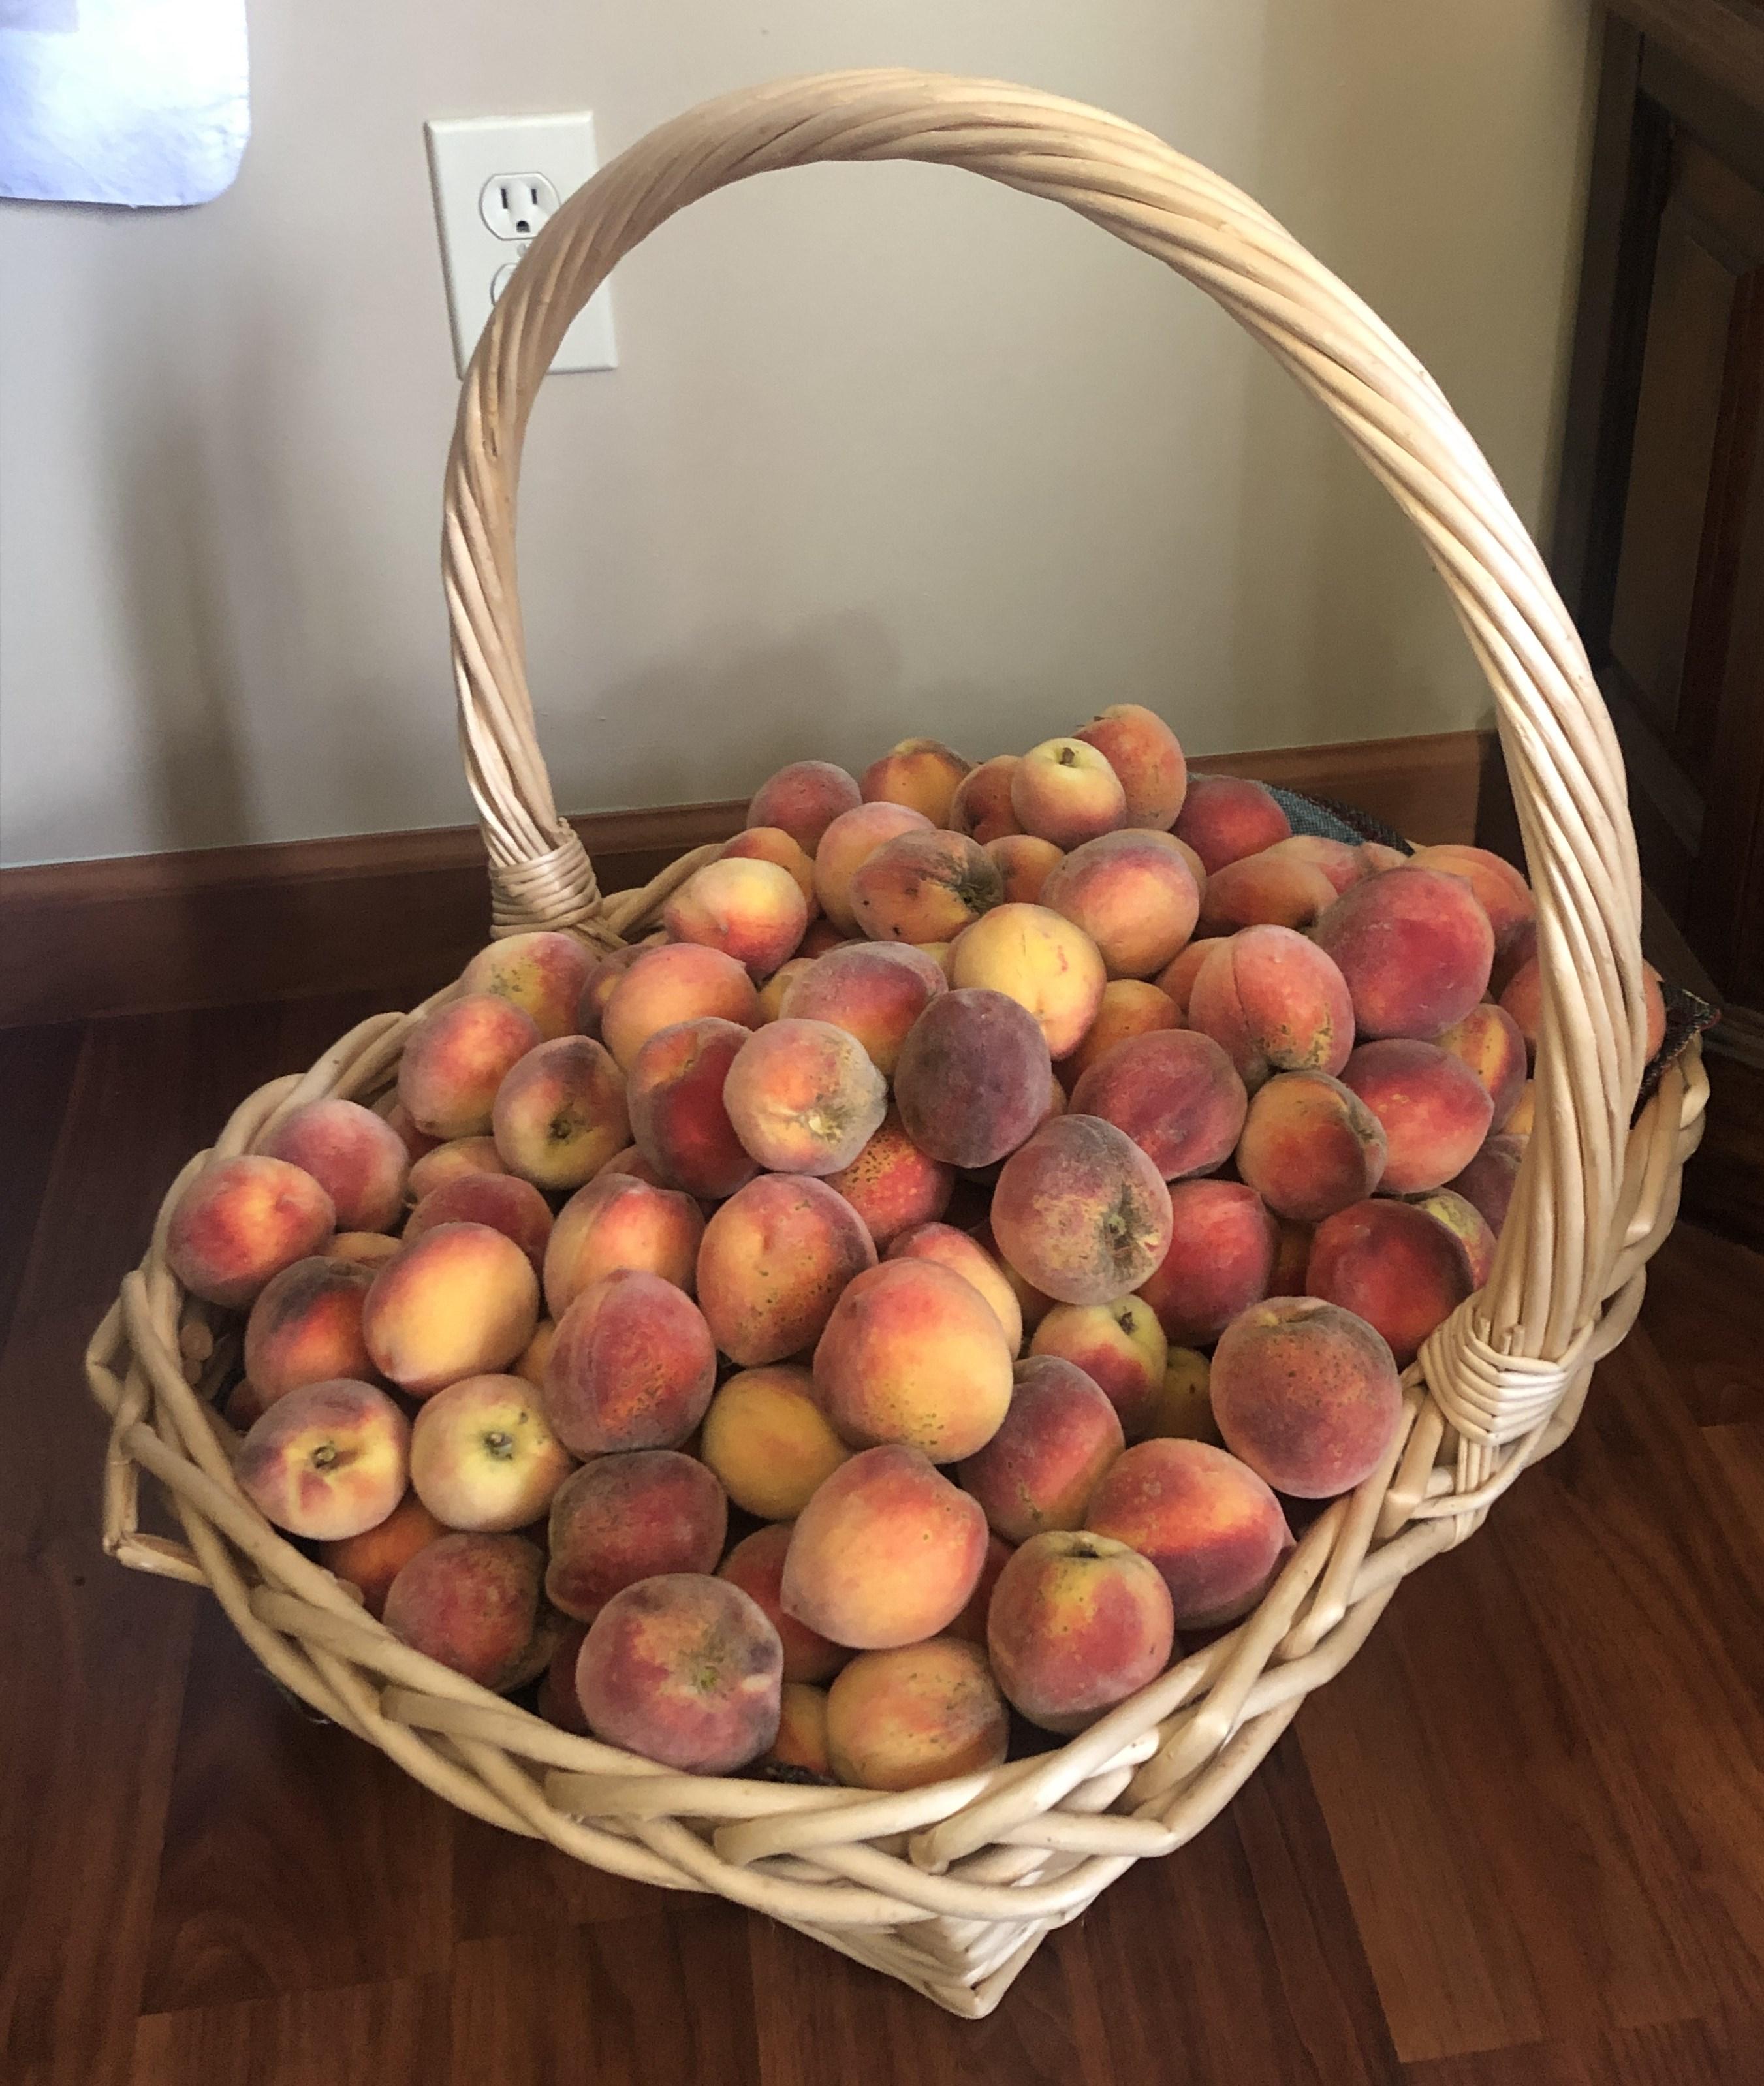 JOE MILITARY Fruit of your life